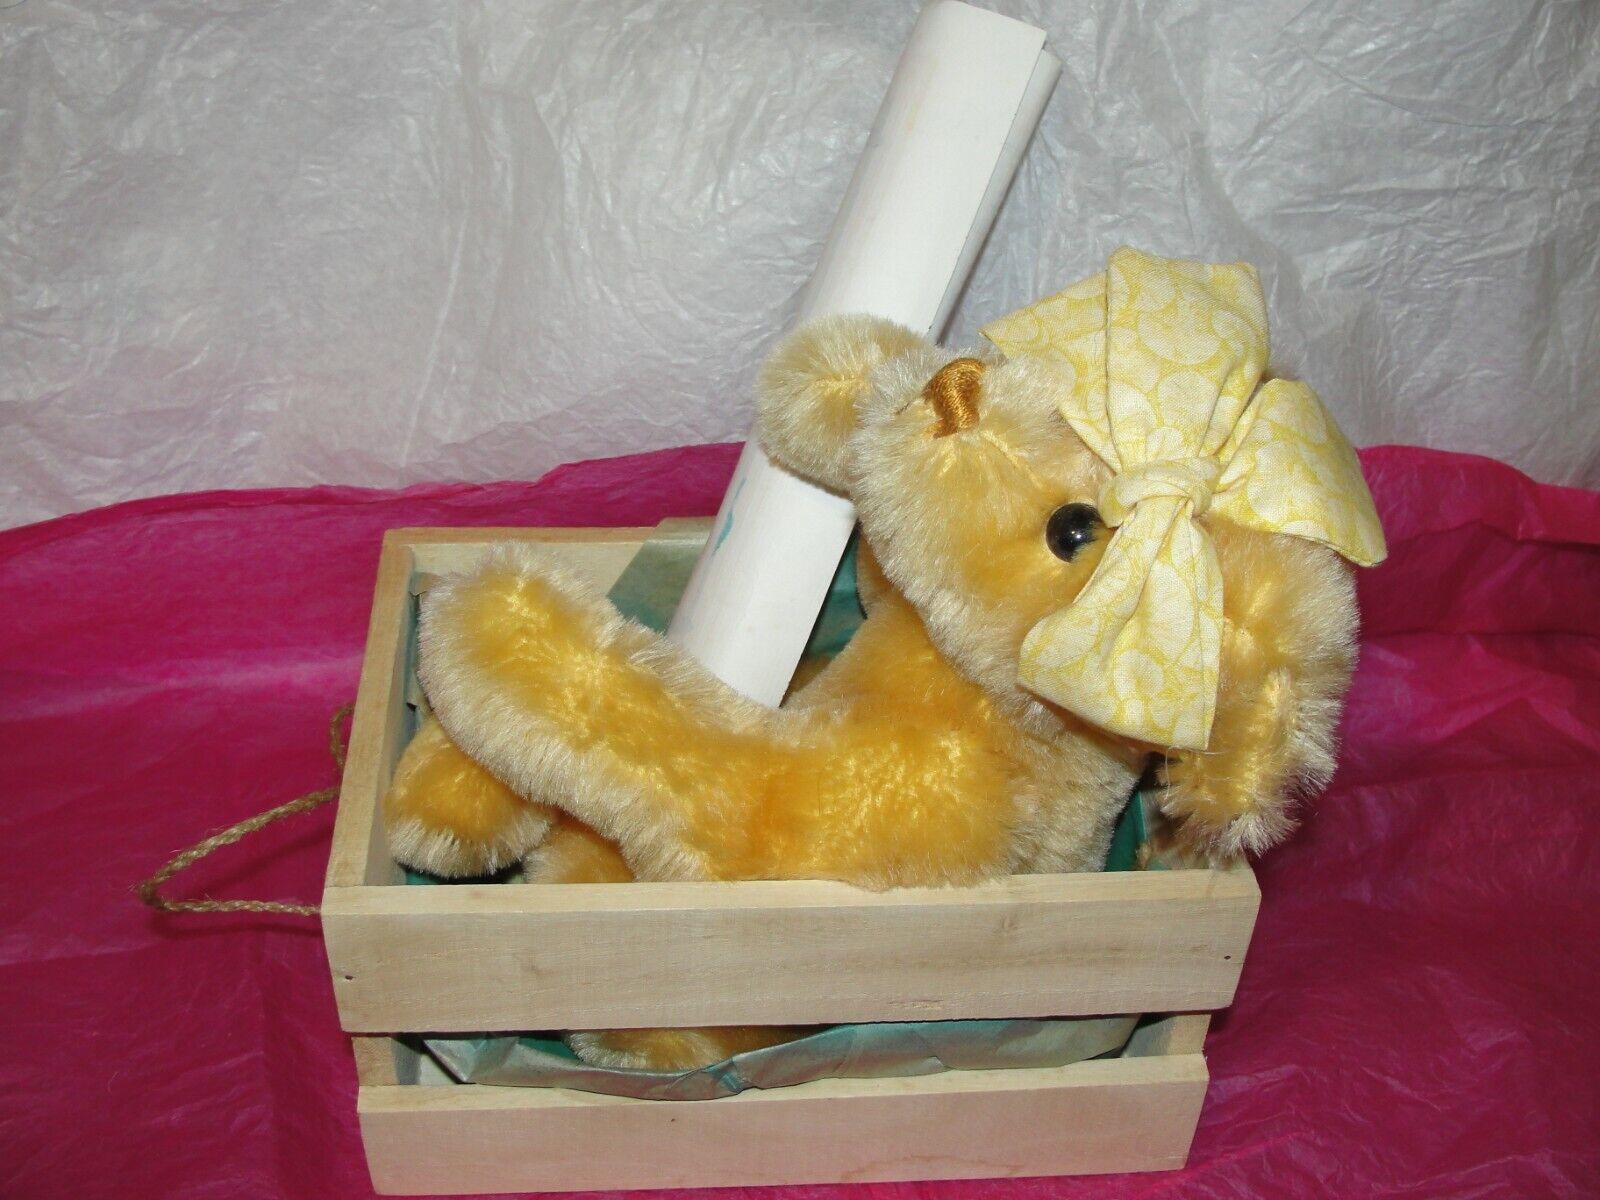 TEDDY BEAR - MERRYTHOUGHT LEMON SORBET